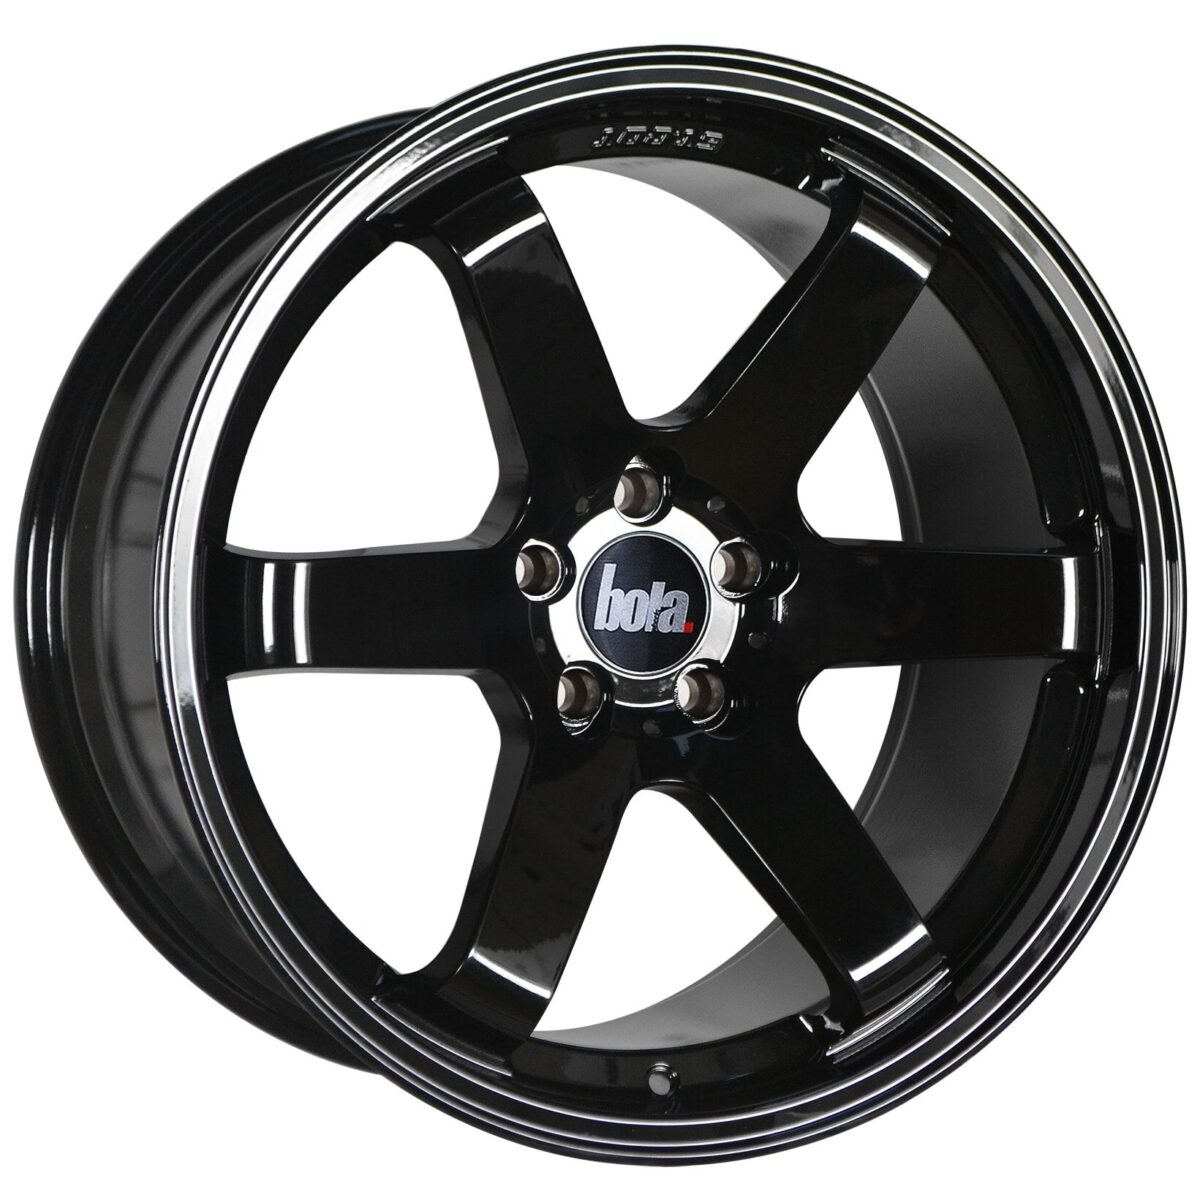 "19"" BOLA B1 Wheels - Gloss Black - All BMW Models"